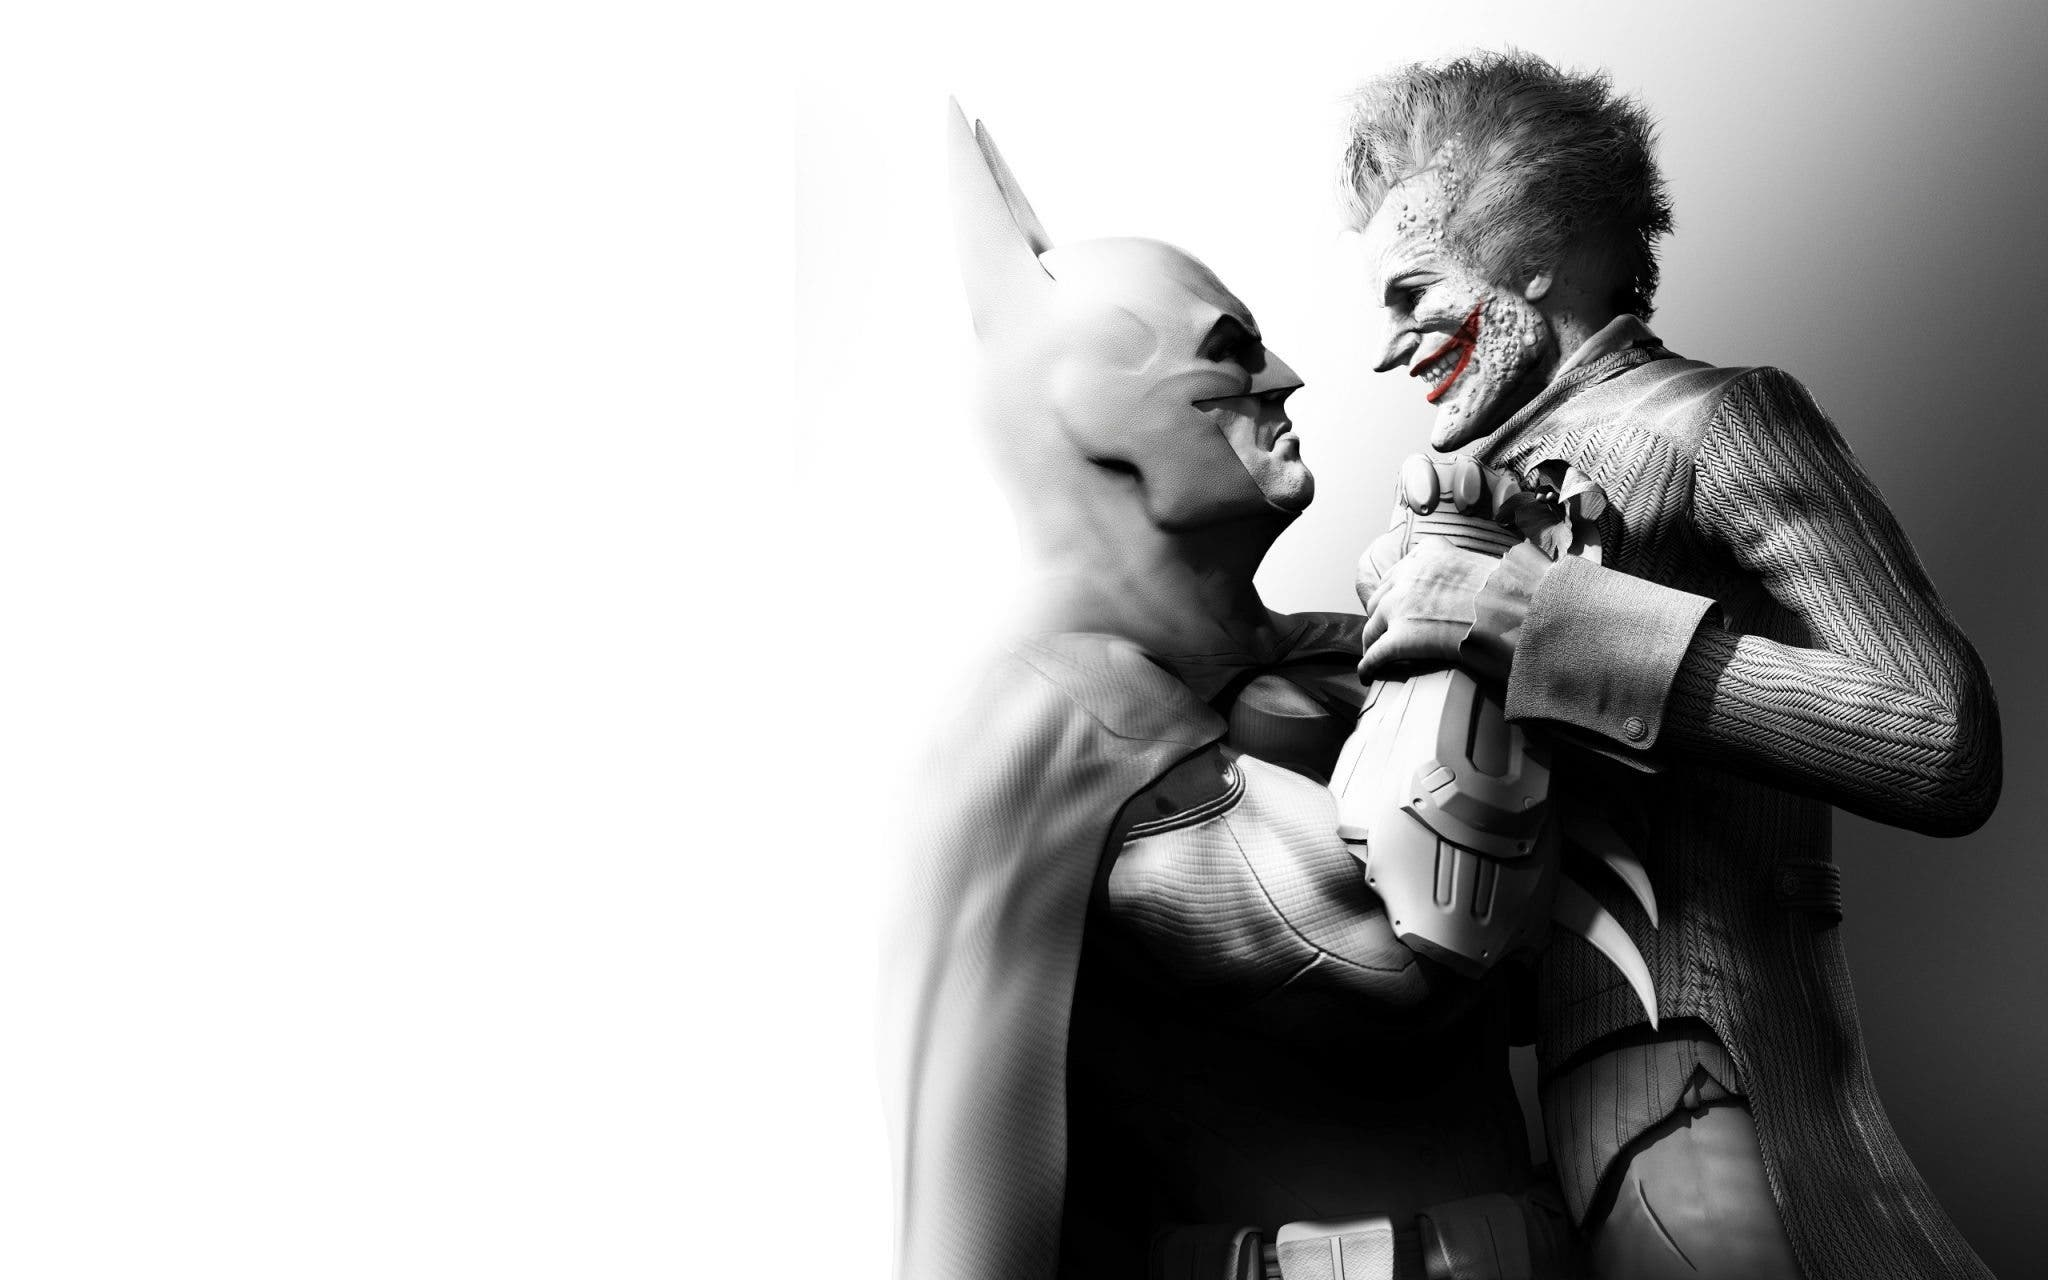 Бэтмен герои комиксов Джокер  № 3922528 без смс